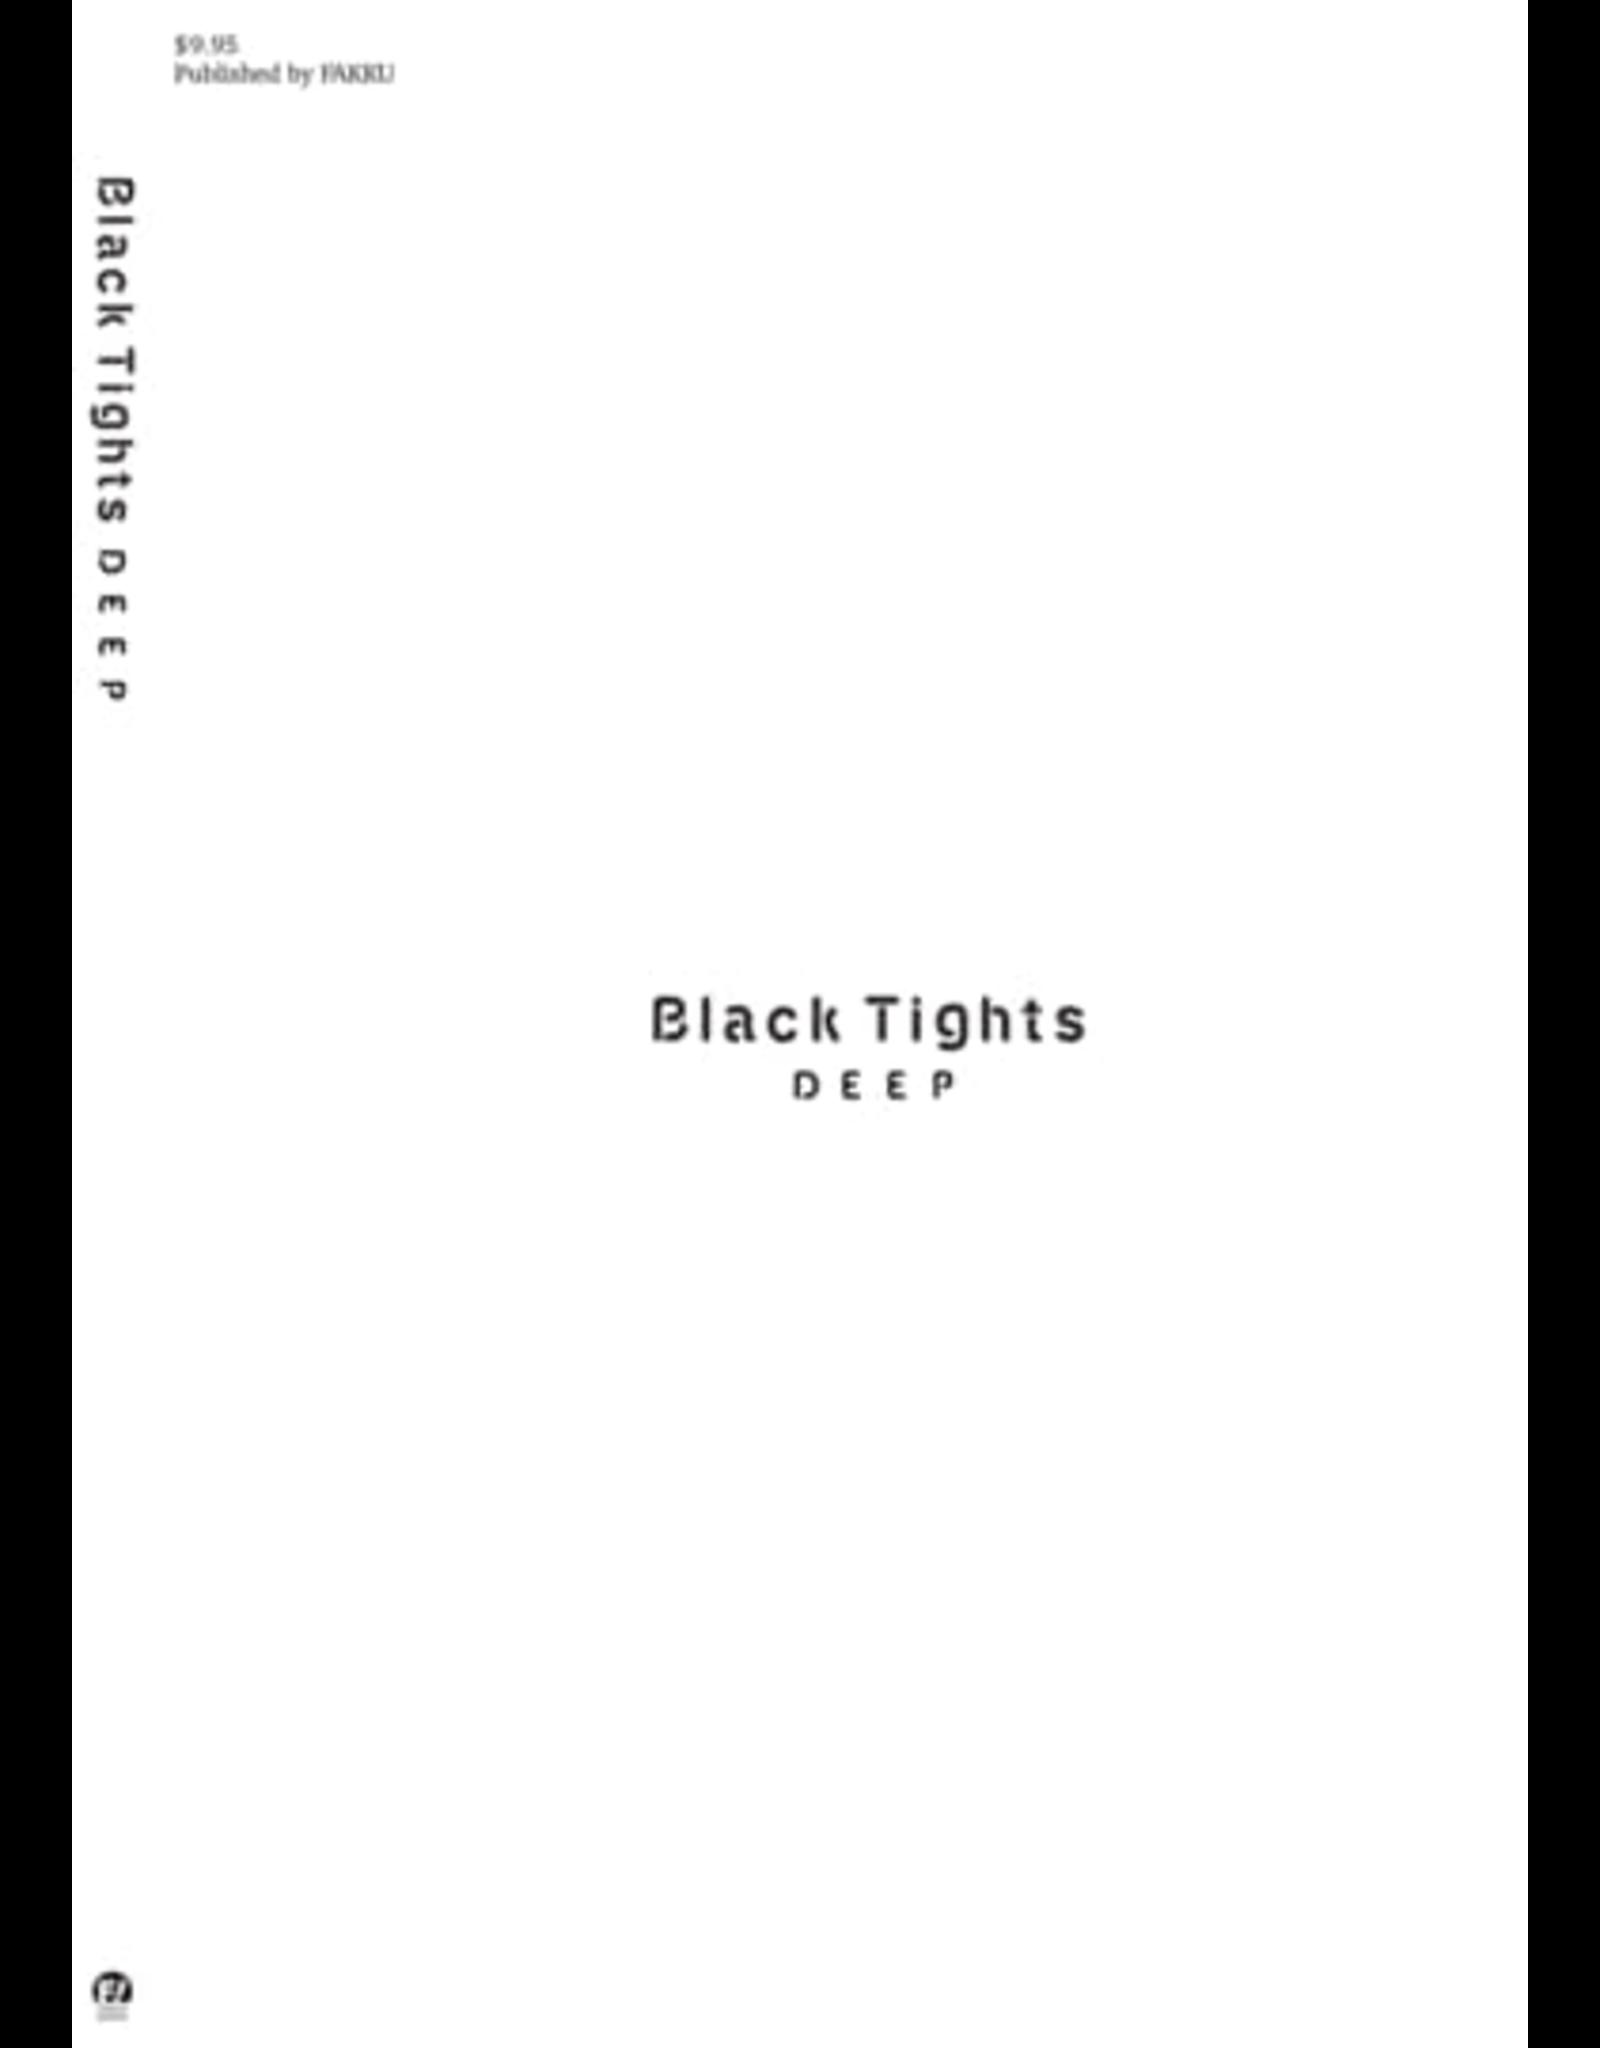 Black Tights Deep - Art Book - 102 pages (Engelstalig)